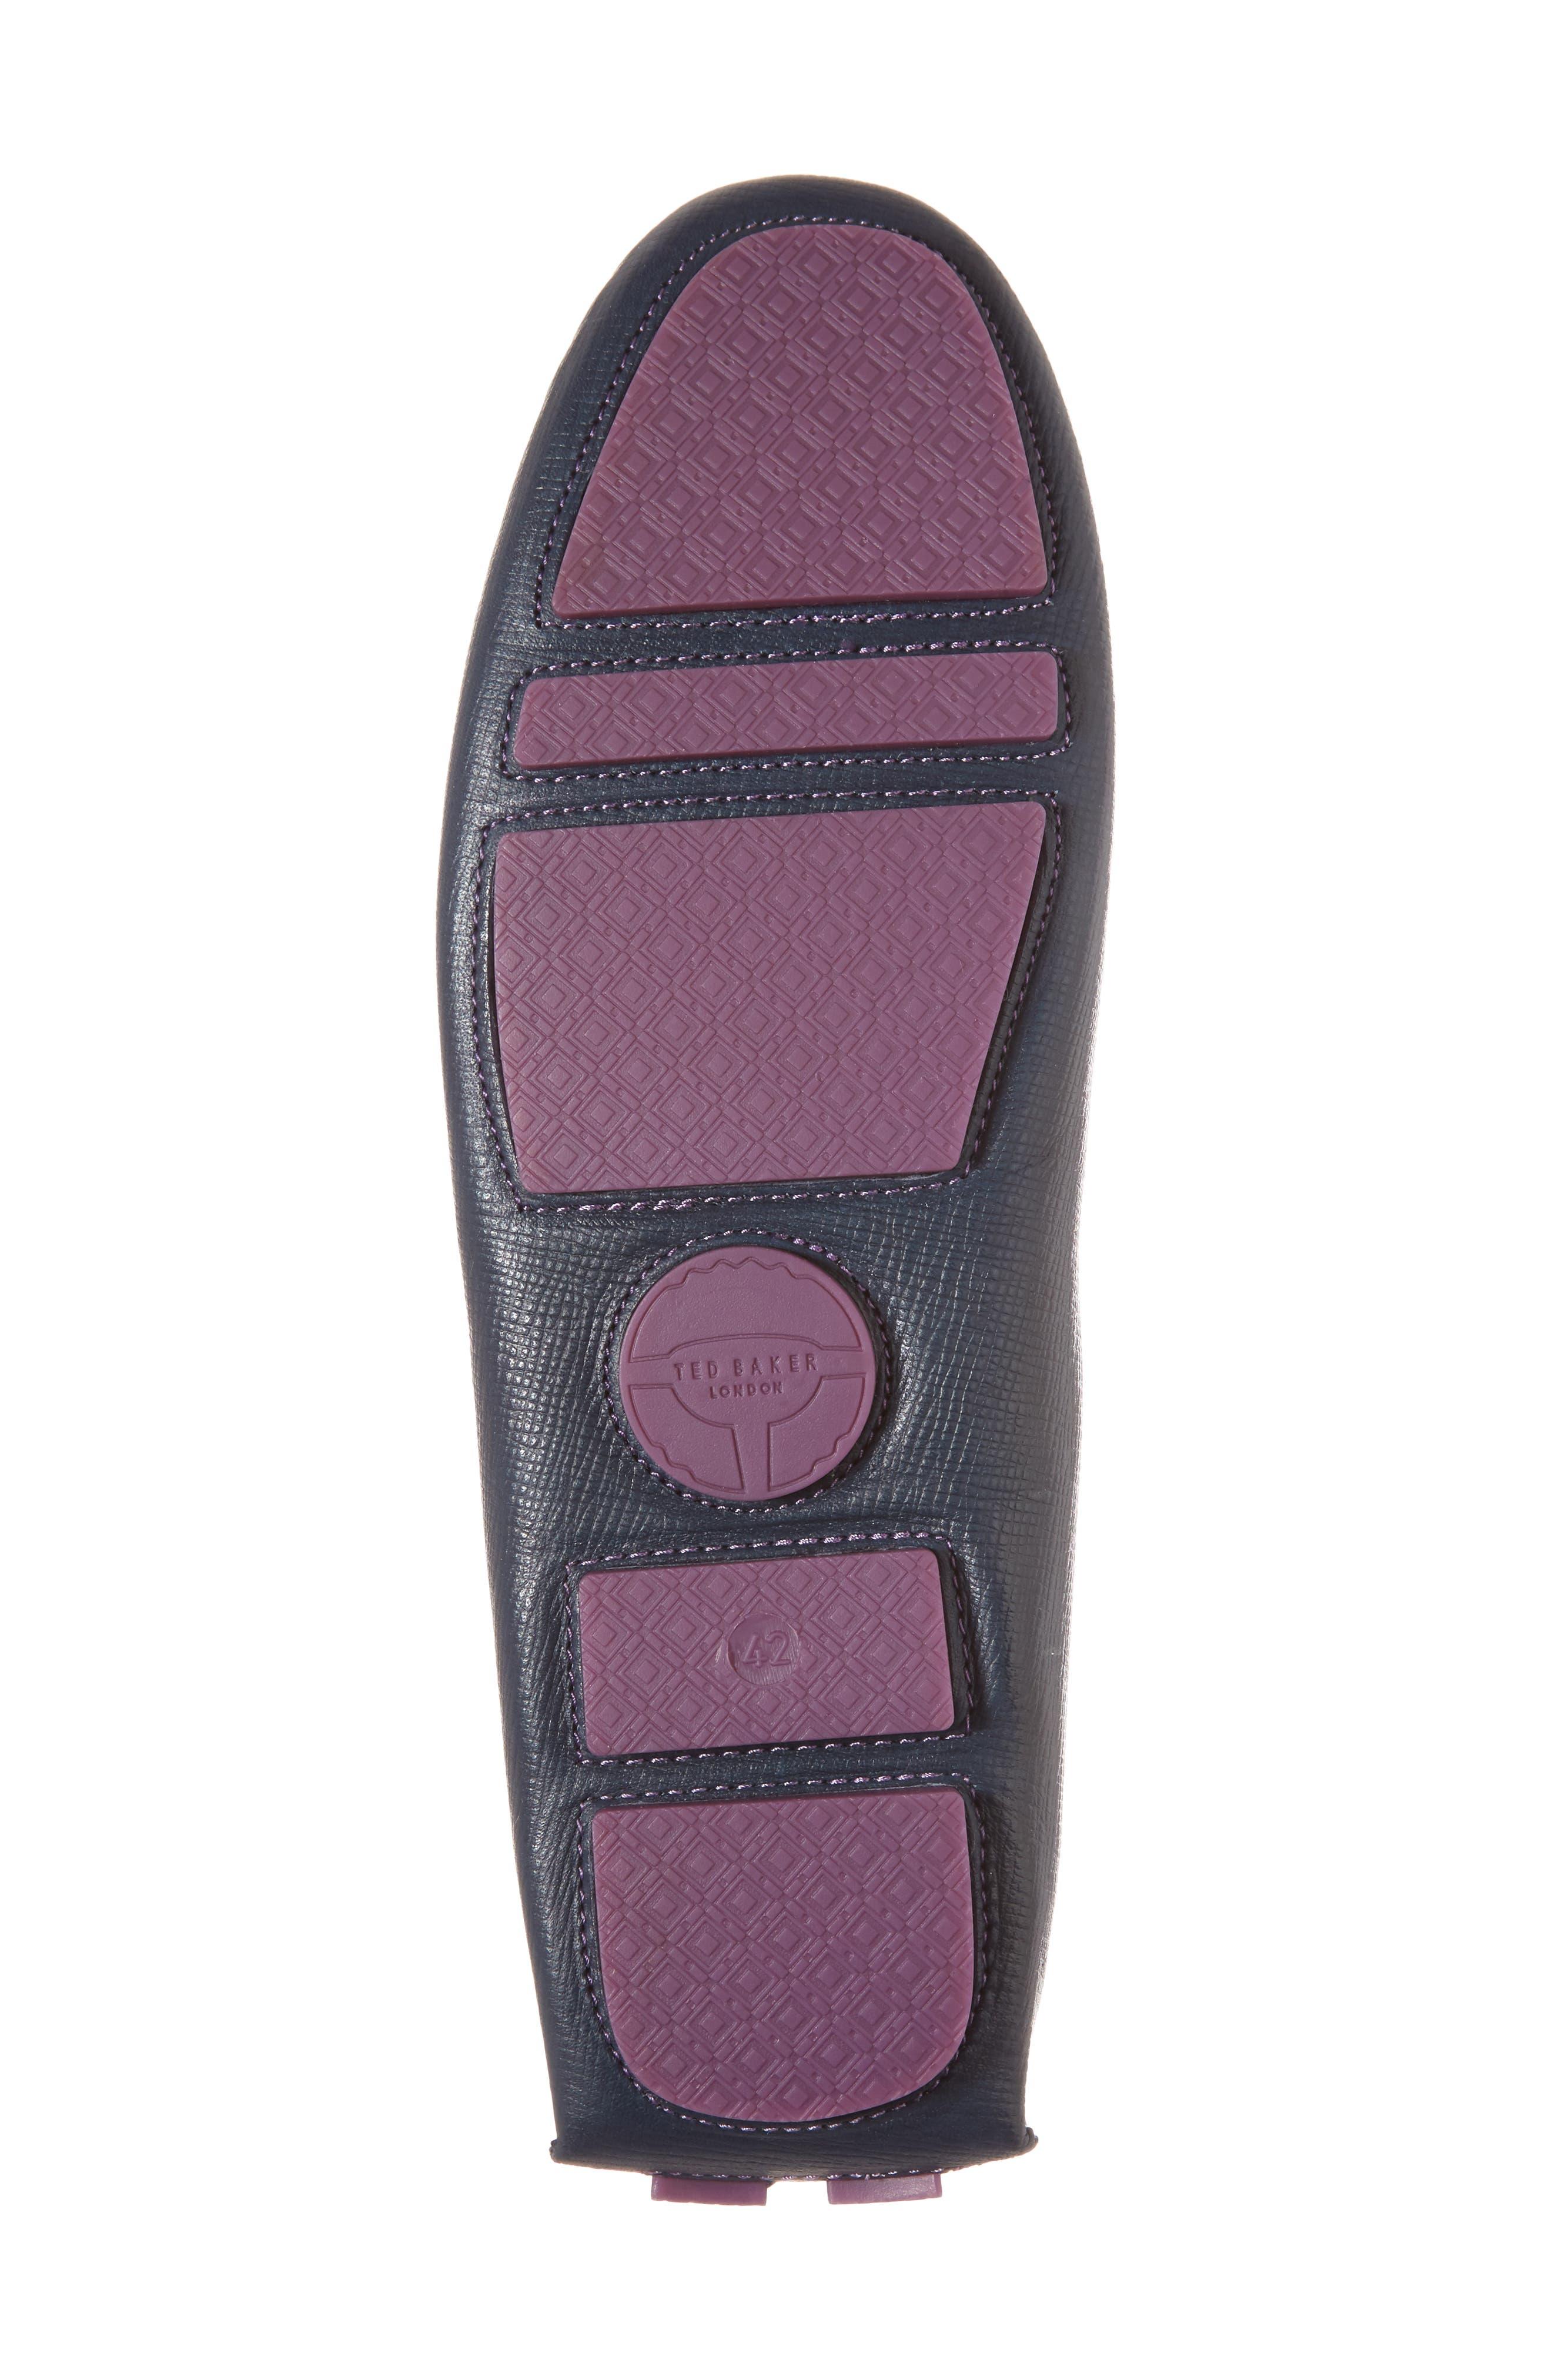 Urbonn Tasseled Driving Loafer,                             Alternate thumbnail 6, color,                             Dark Blue Leather